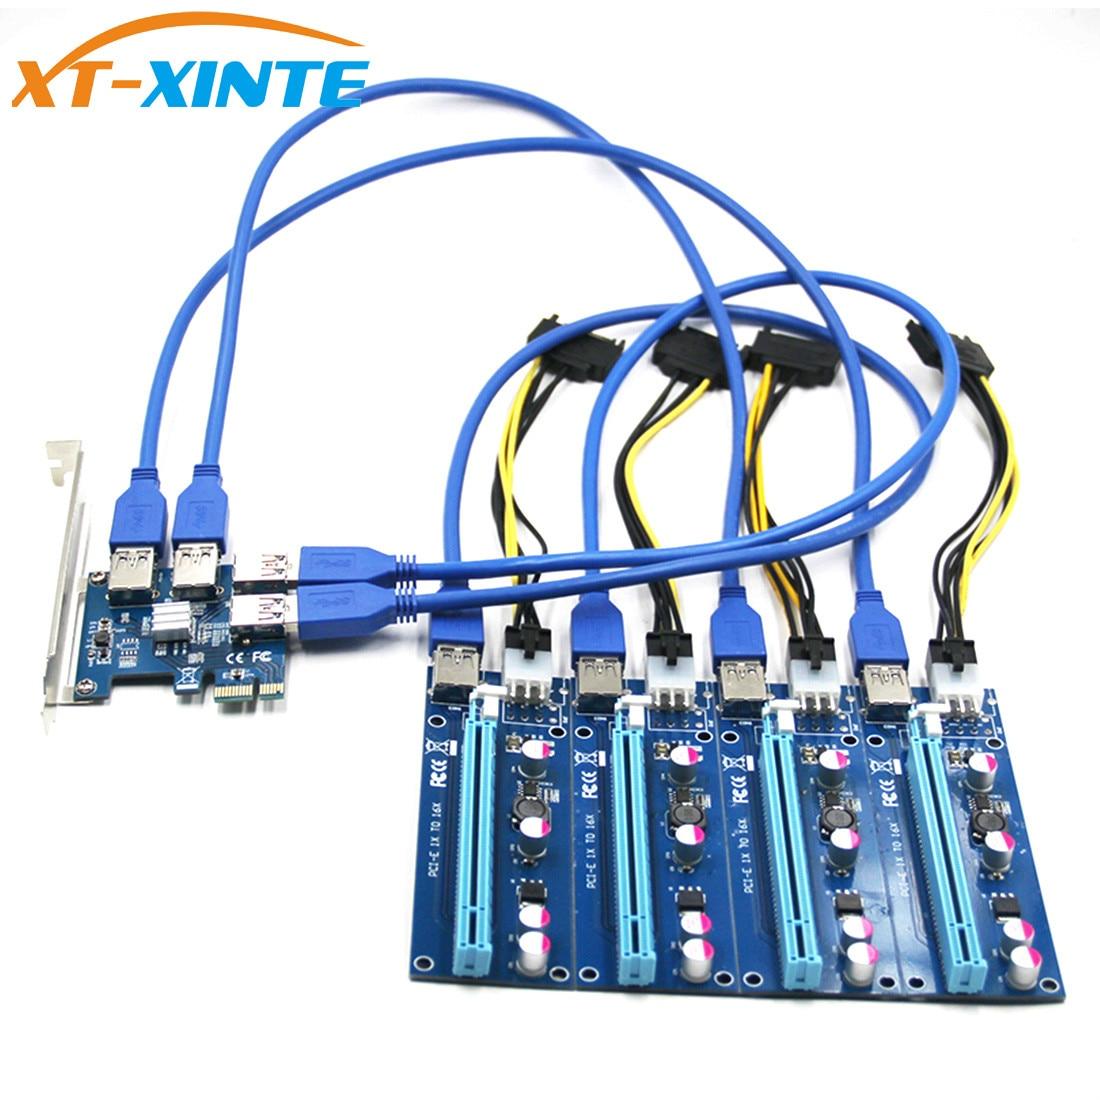 USB 3,0 PCI-E Express 1x a 16x extensor Riser tarjeta adaptador Pcie 1 a 4 USB convertidor gráficos tarjeta de vídeo para Miner BTC Litcoin